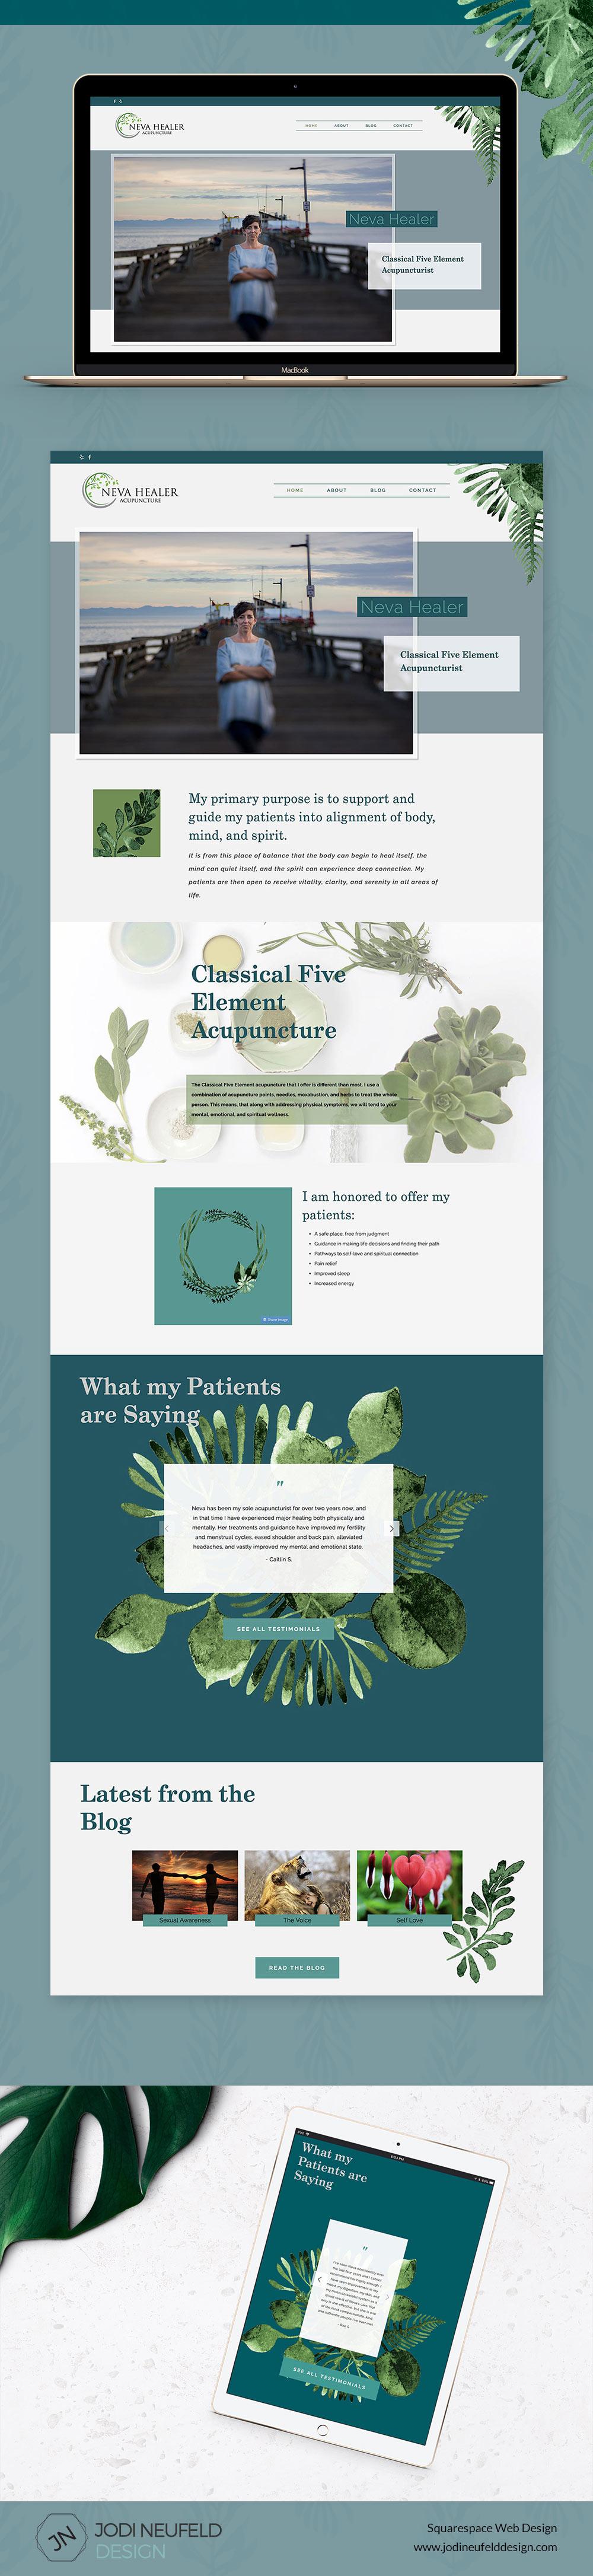 Neva Healer Squarespace website design by Jodi Neufeld Design